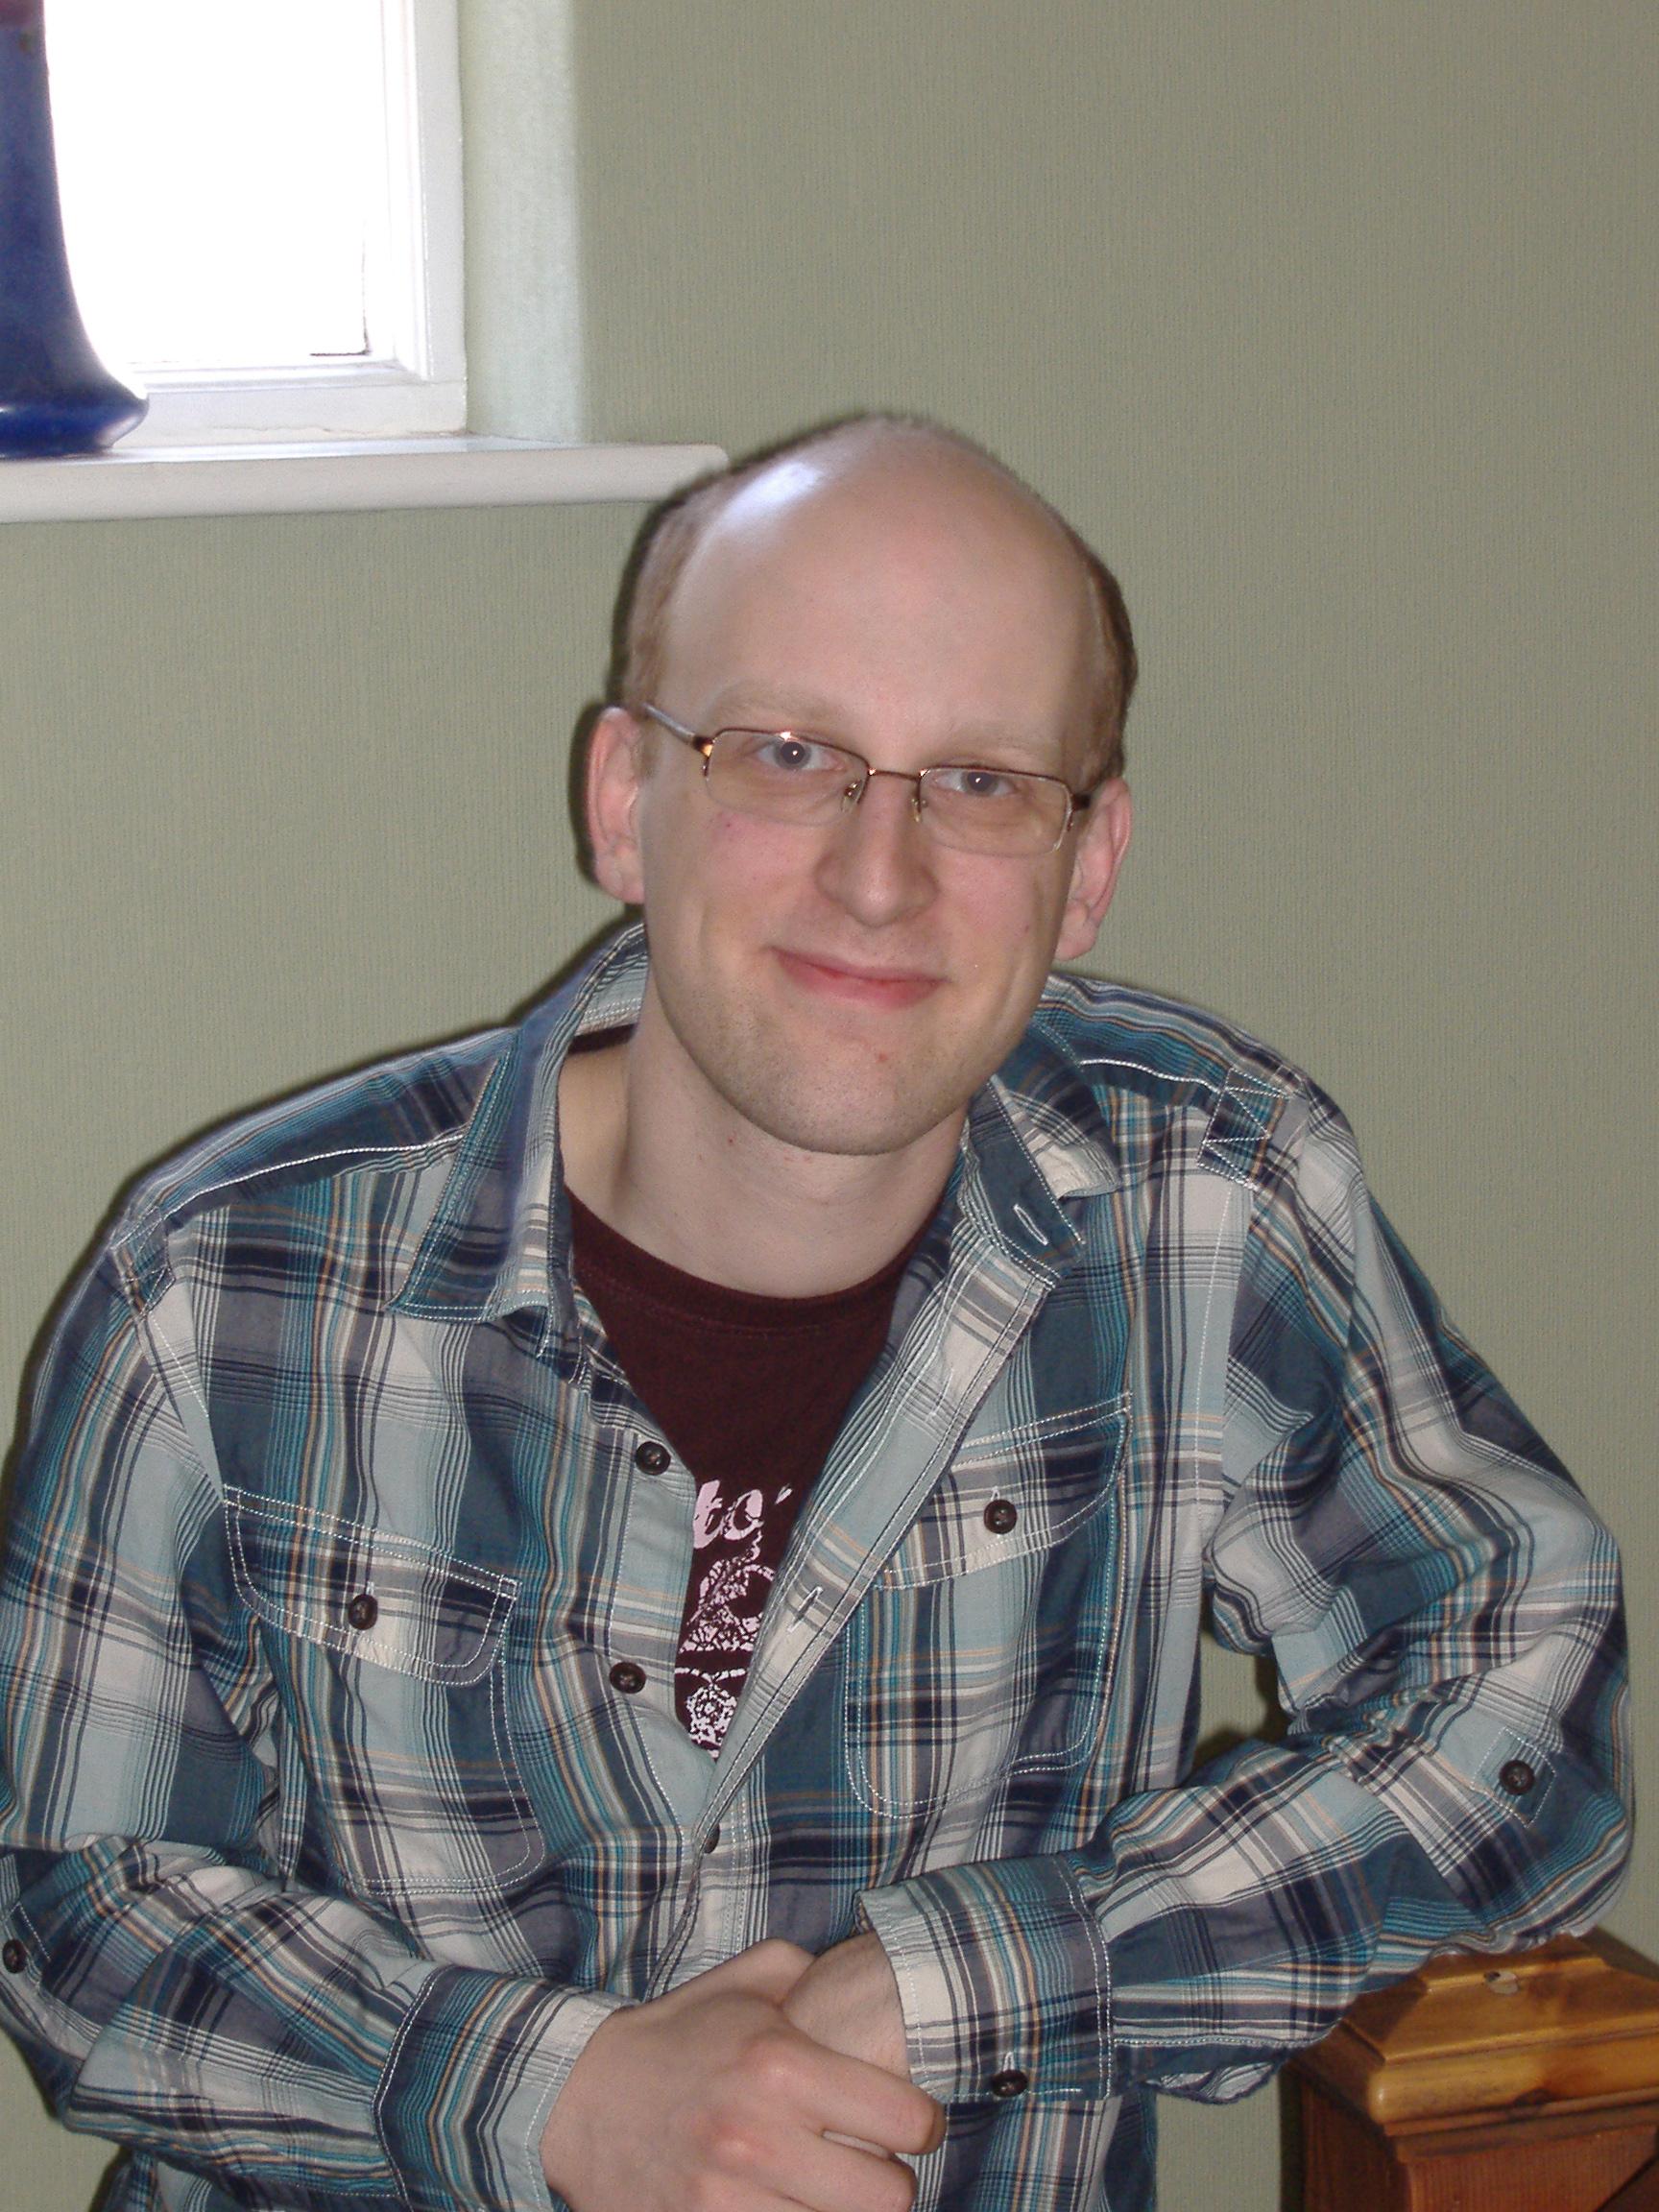 DC Wood author photo